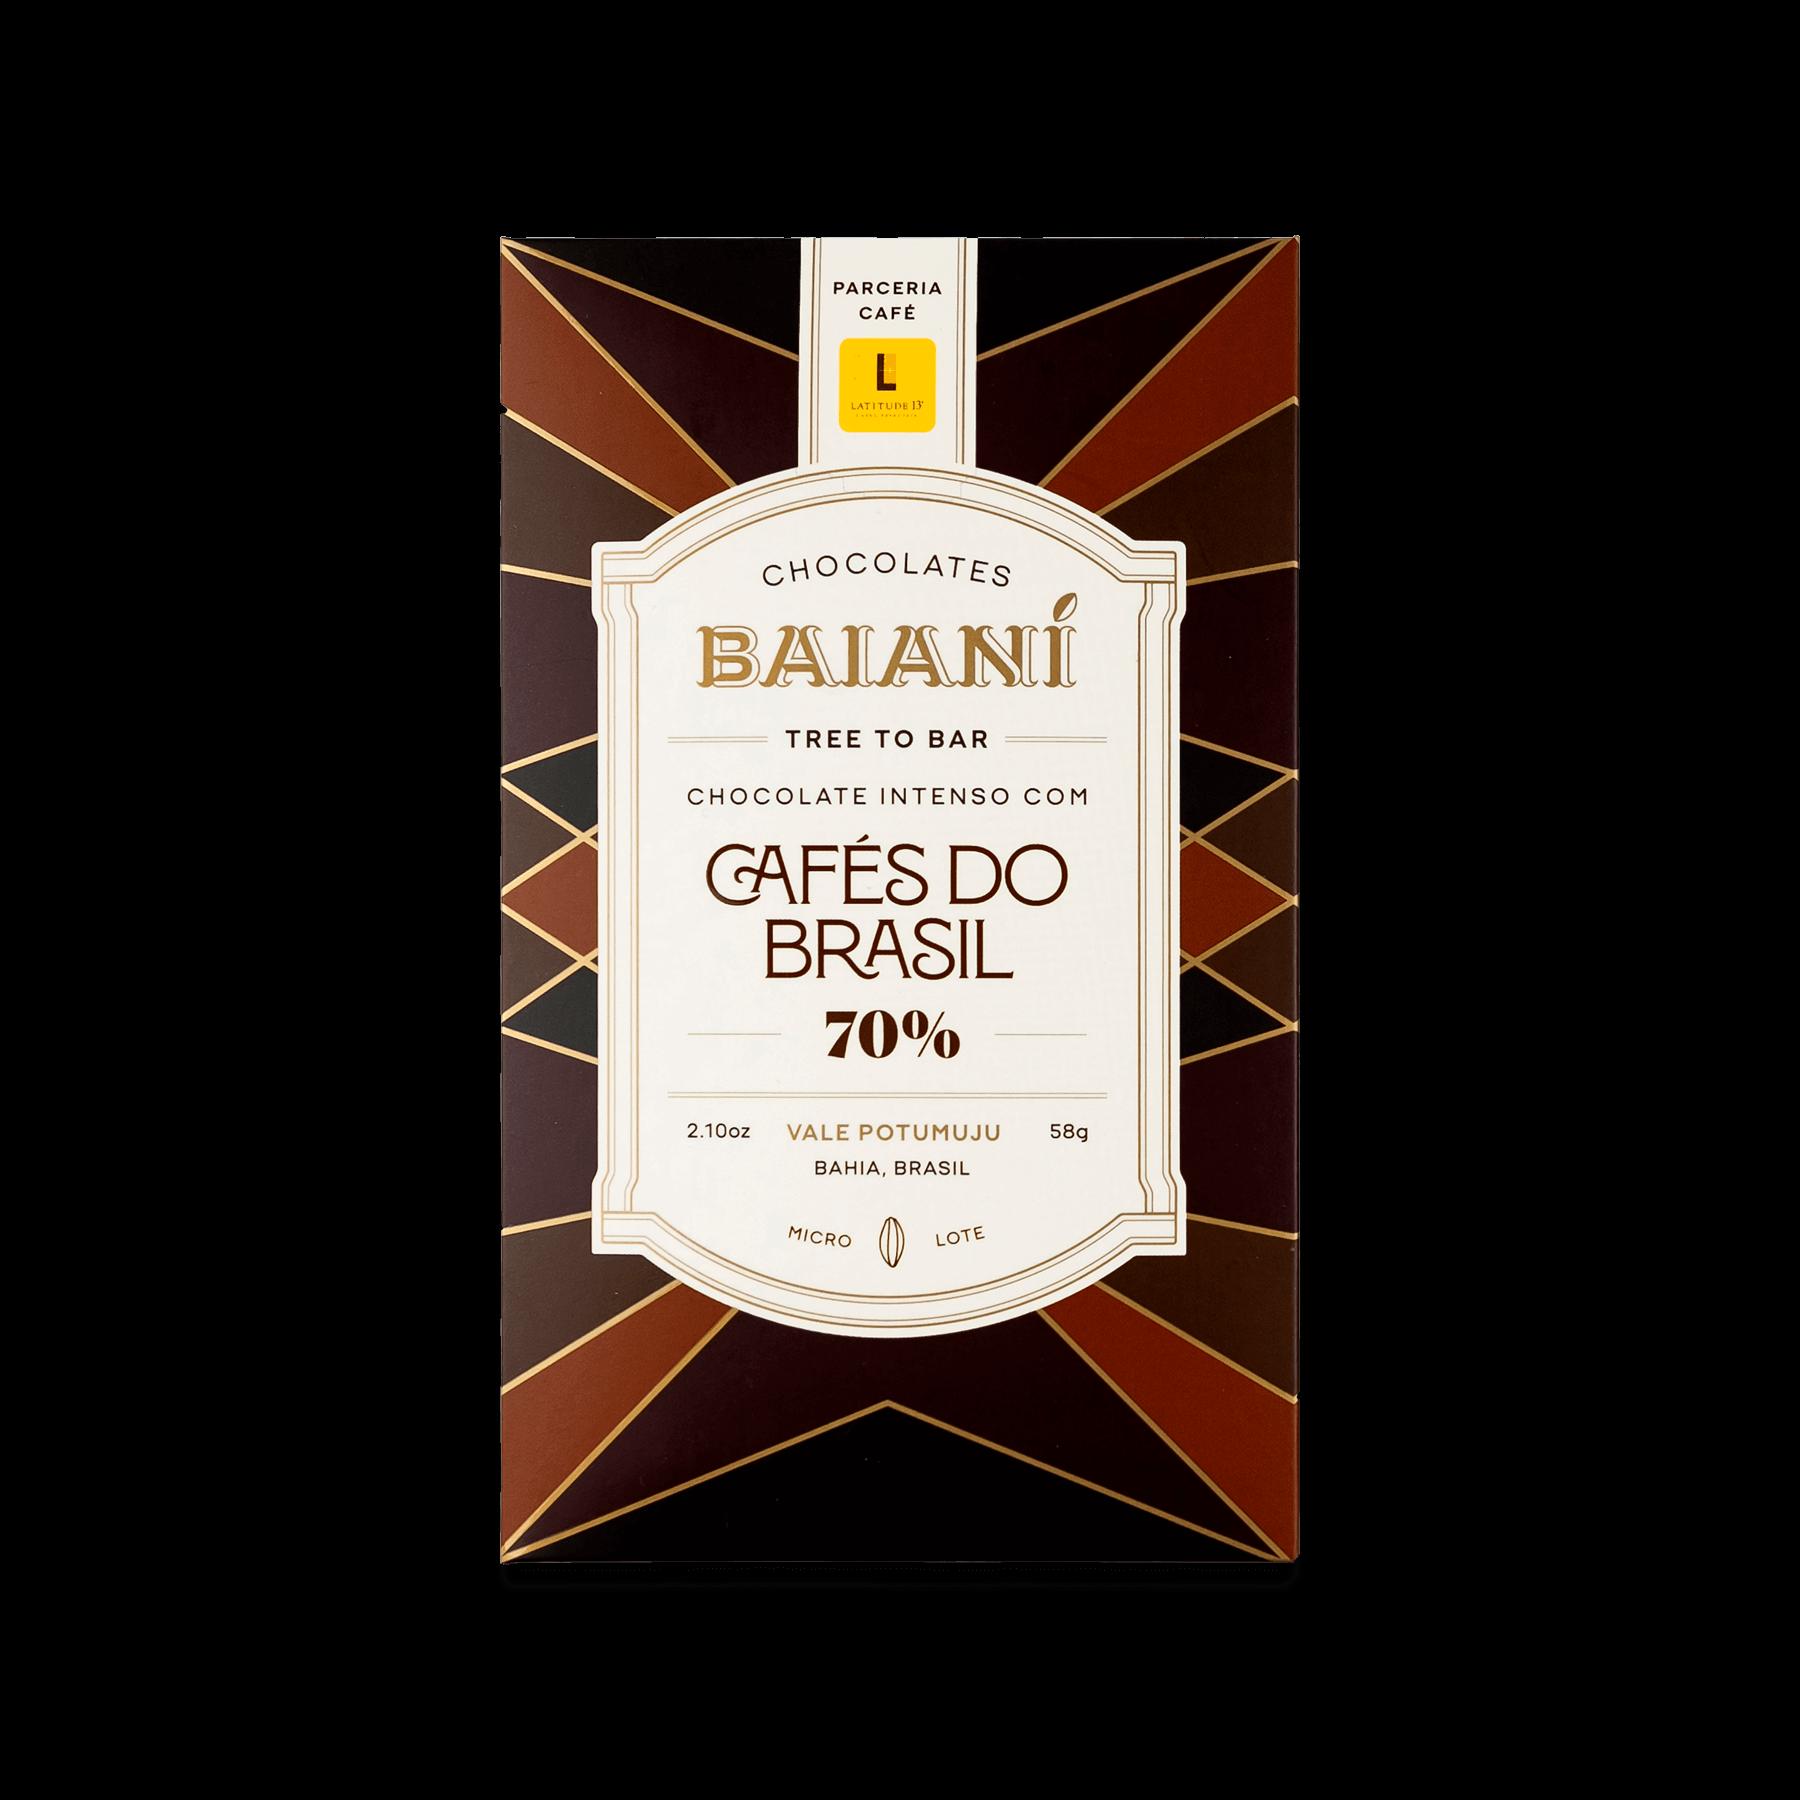 70% Cafés do Brasil – Latitude 13º